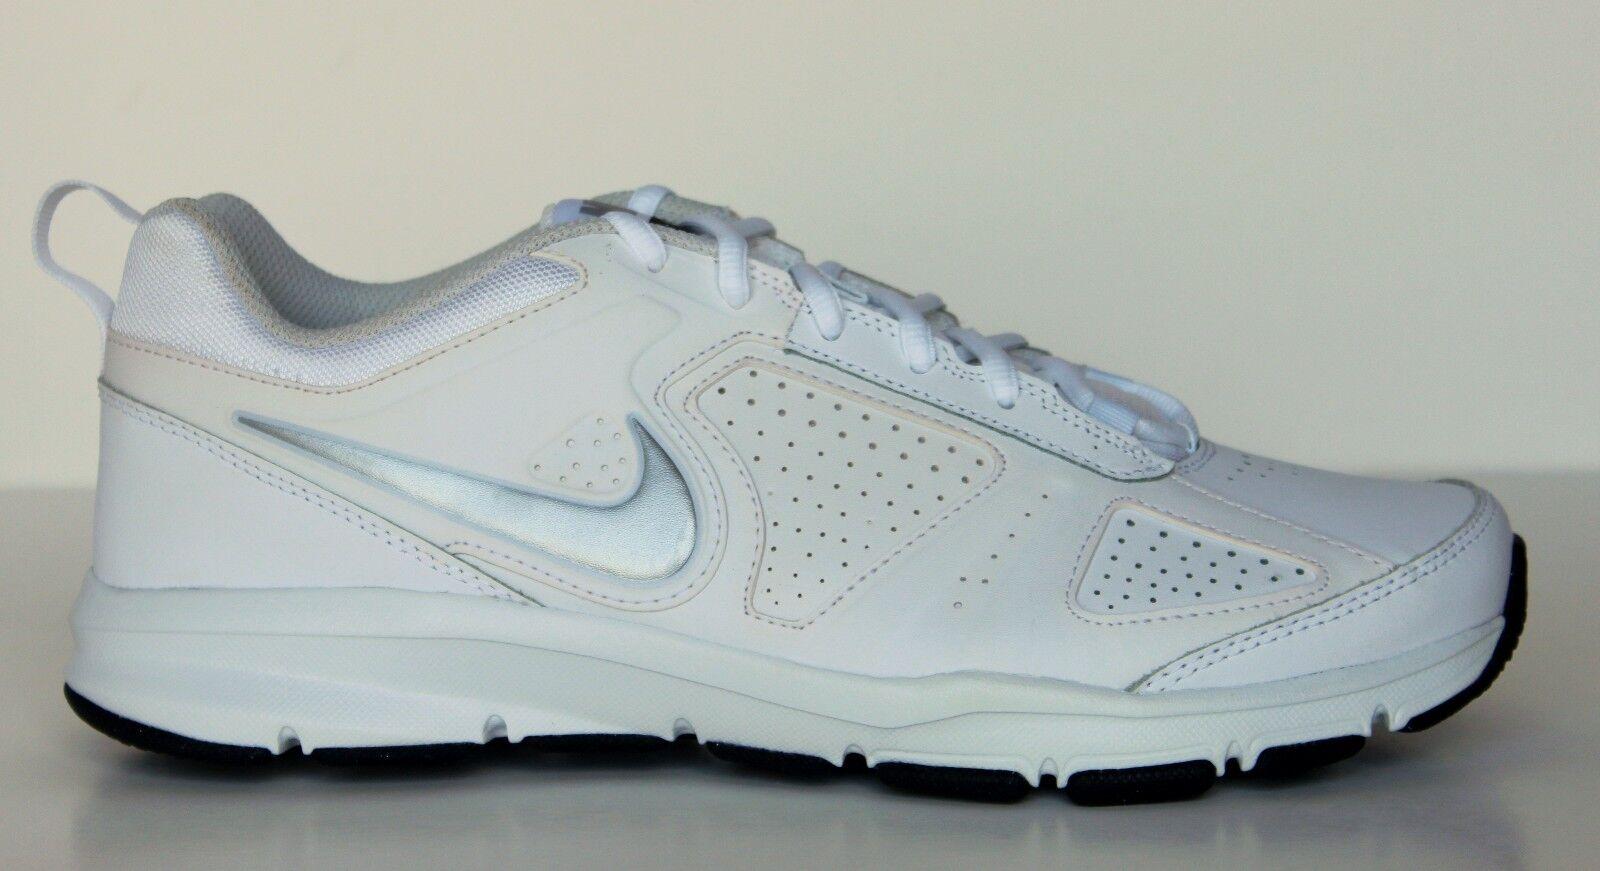 Nike t-lite xi xi xi Uomo bianco lthr crosstrainer scarpe 616544-100 nwd volume 6 15 m b63305